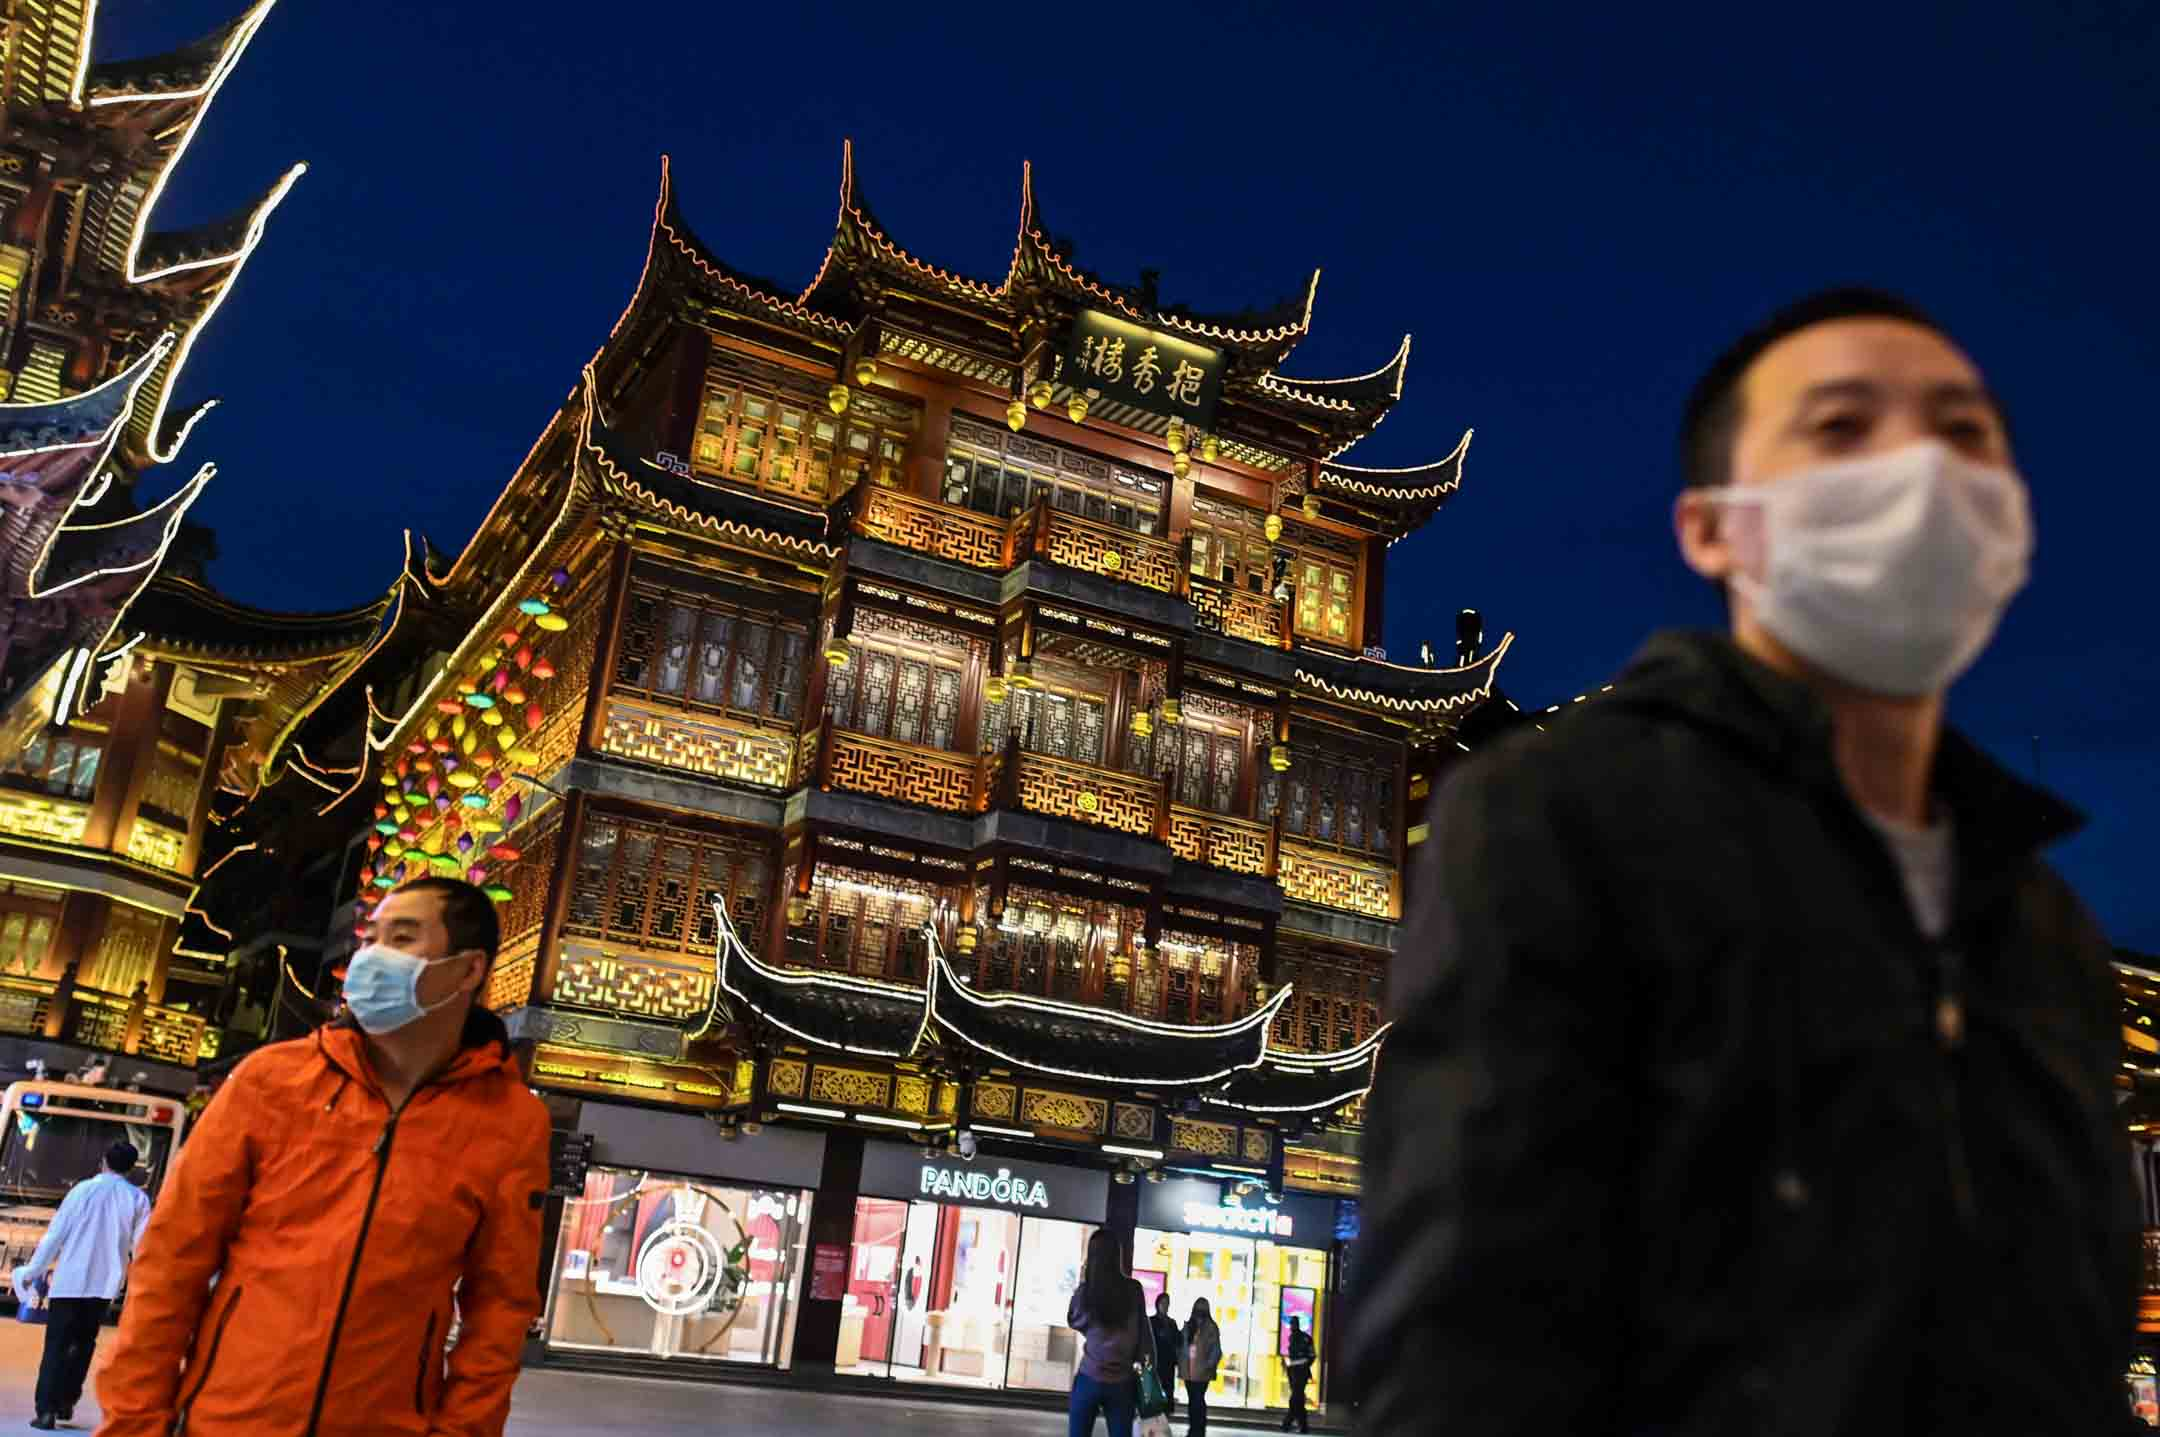 2020年3月23日,戴著口罩預防2019冠狀病毒的市民於上海豫園。 攝: Hector Retamal/AFP via Getty Images